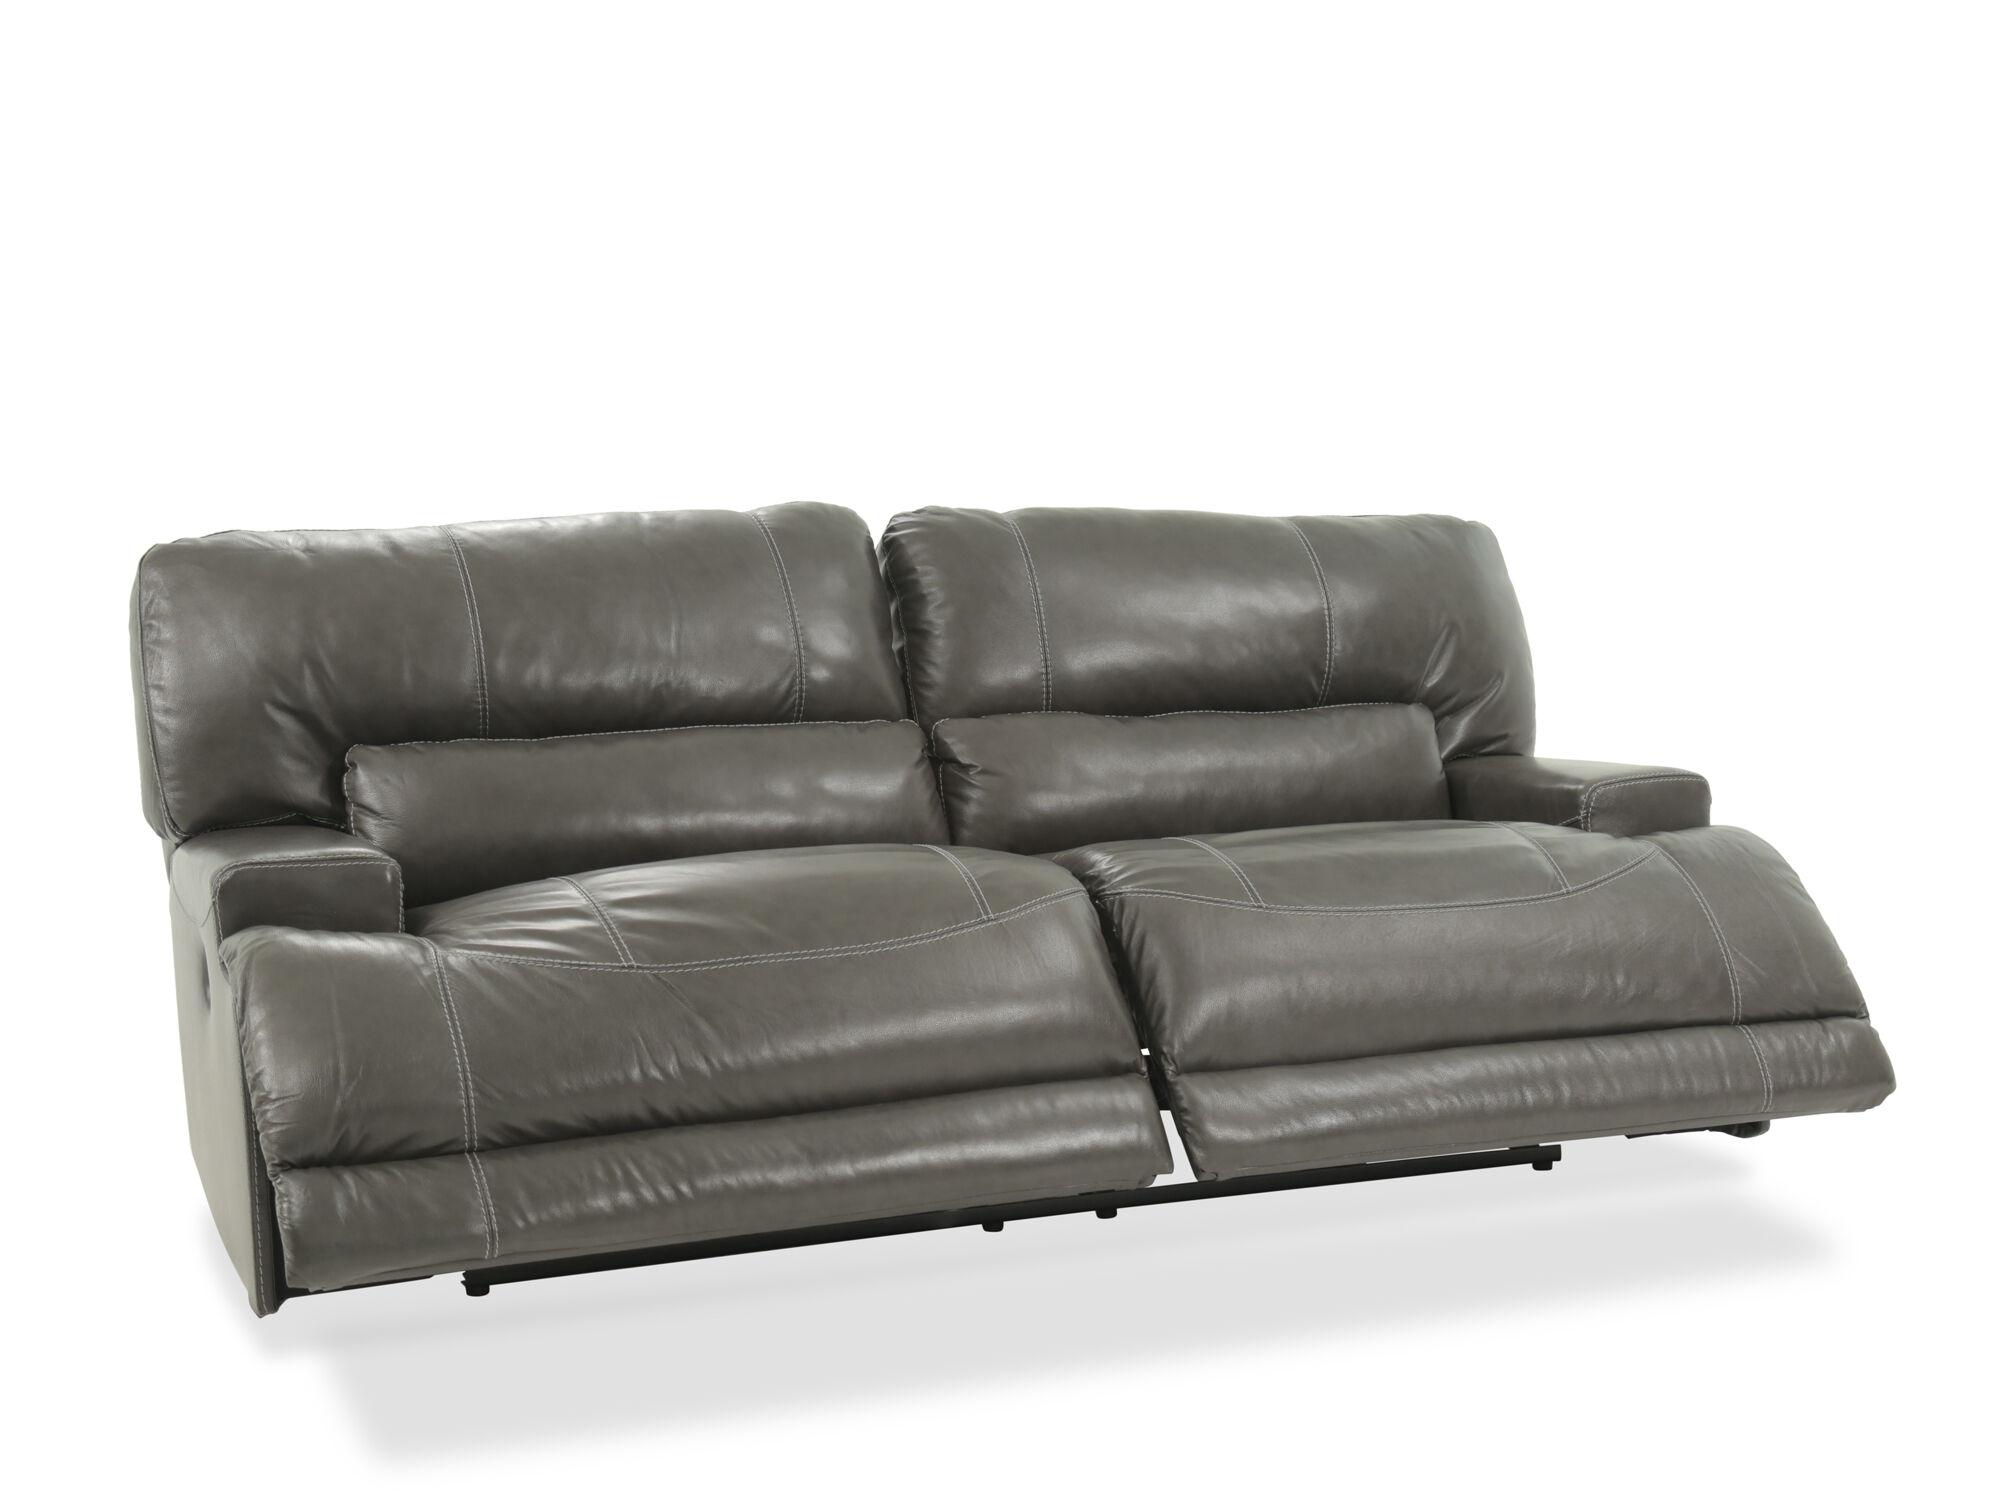 Contemporary 79u0026quot; Power Reclining Sofa In Gray · Contemporary 79u0026quot;  Power Reclining Sofa ...